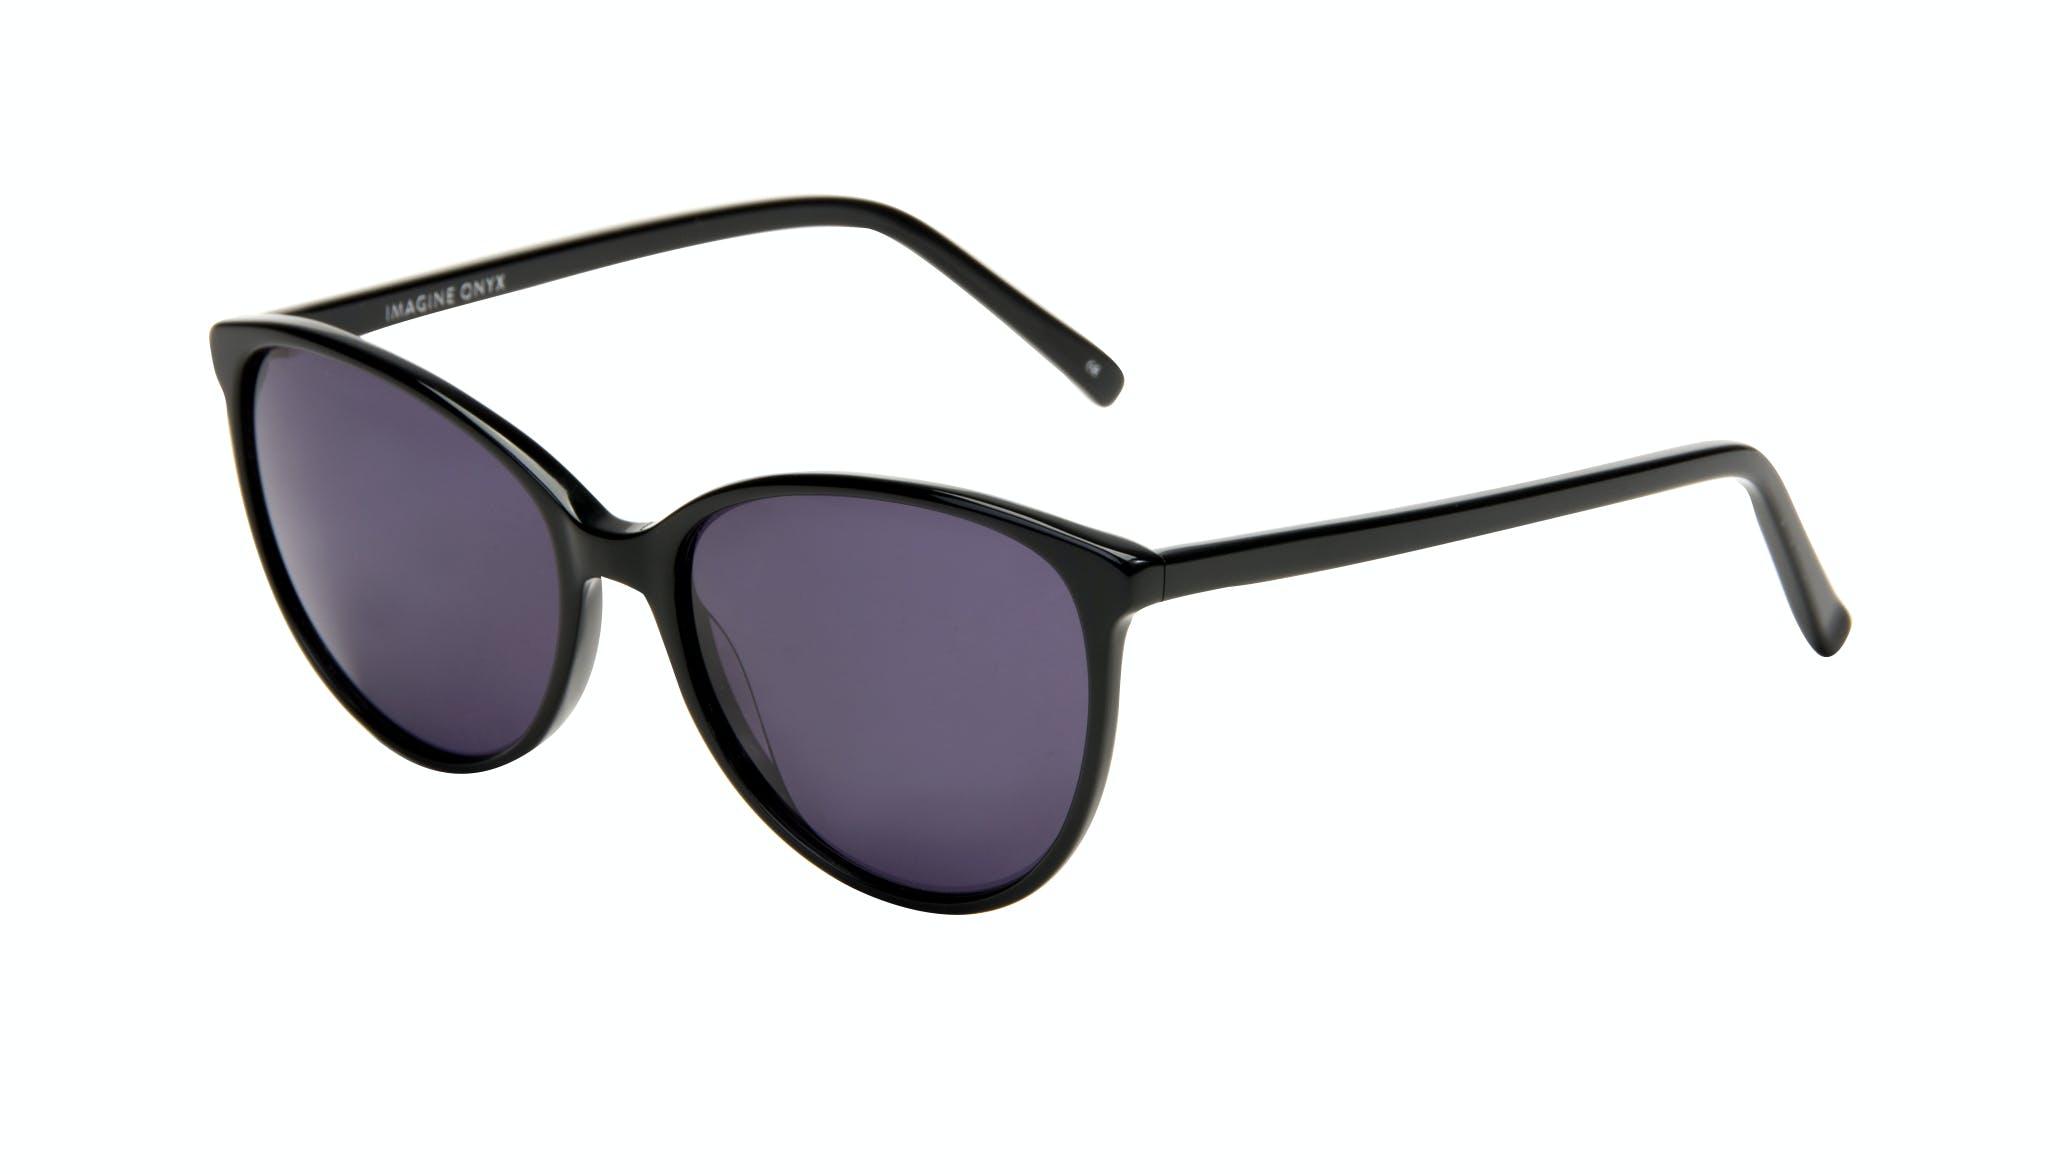 Affordable Fashion Glasses Cat Eye Round Sunglasses Women Imagine Onyx Tilt